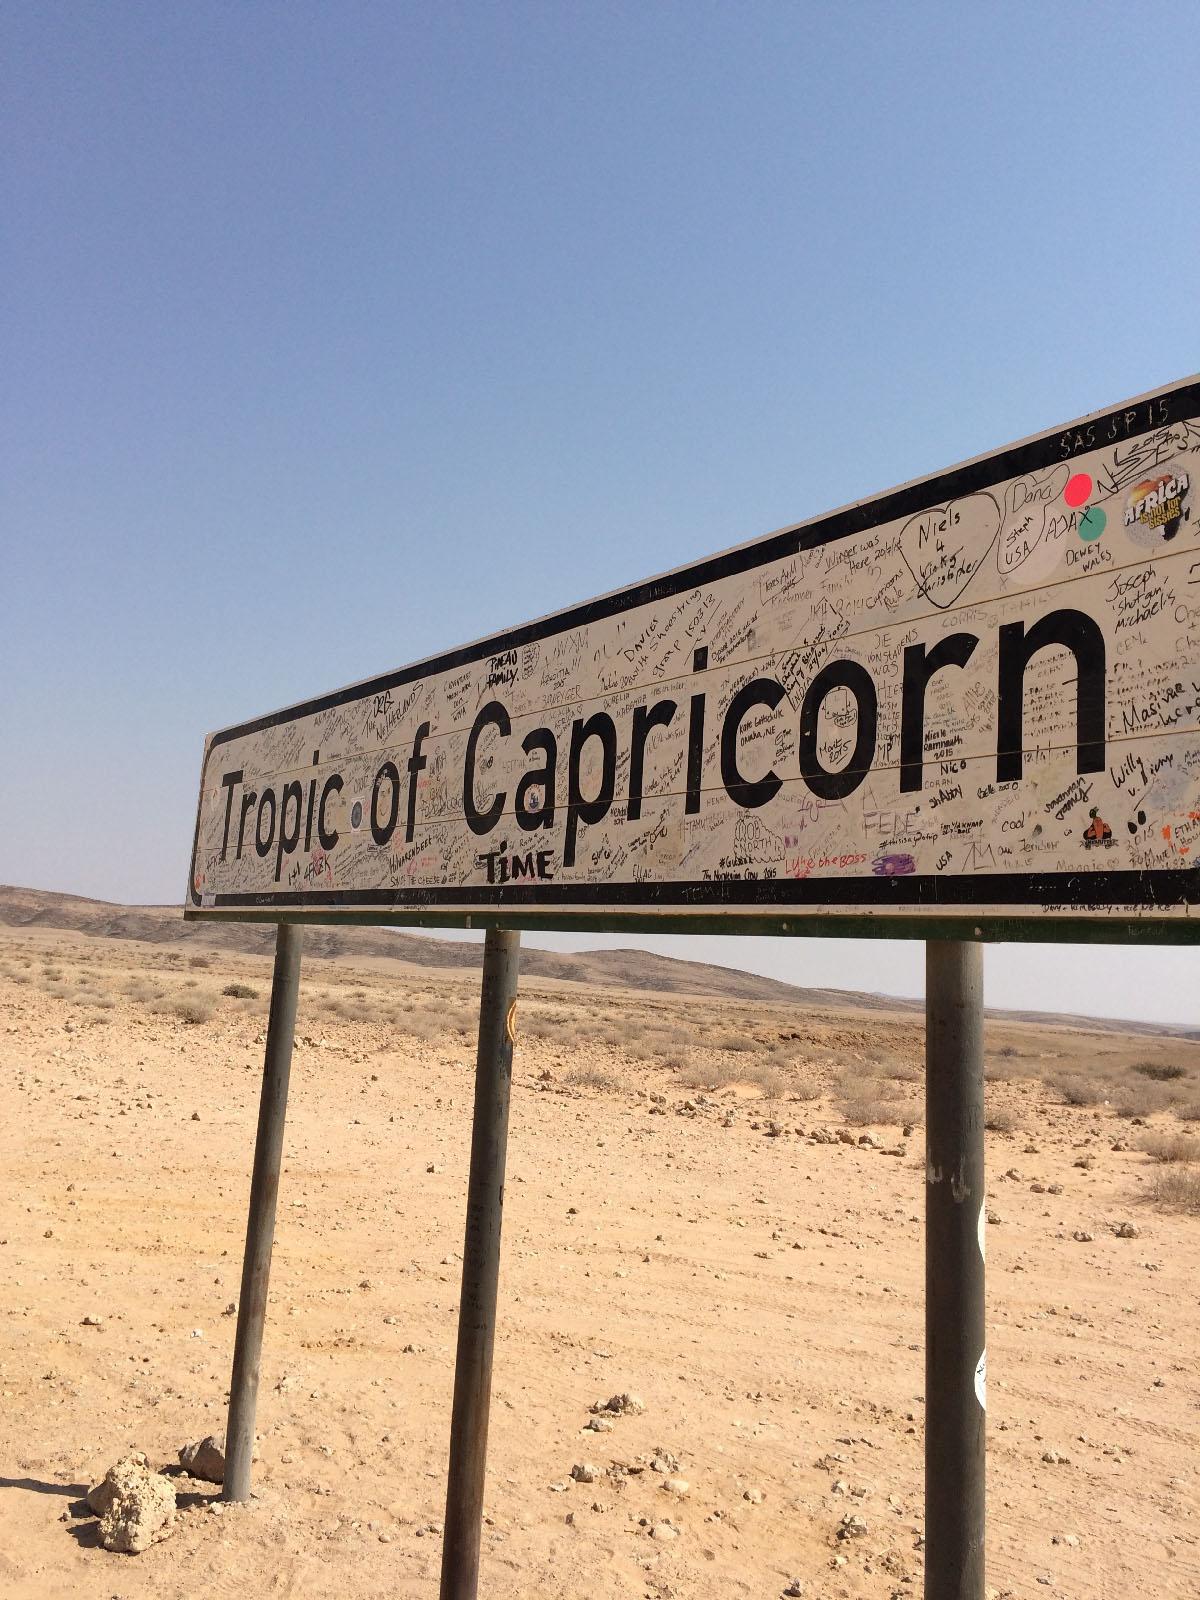 Tropic of Capricorn南回帰線